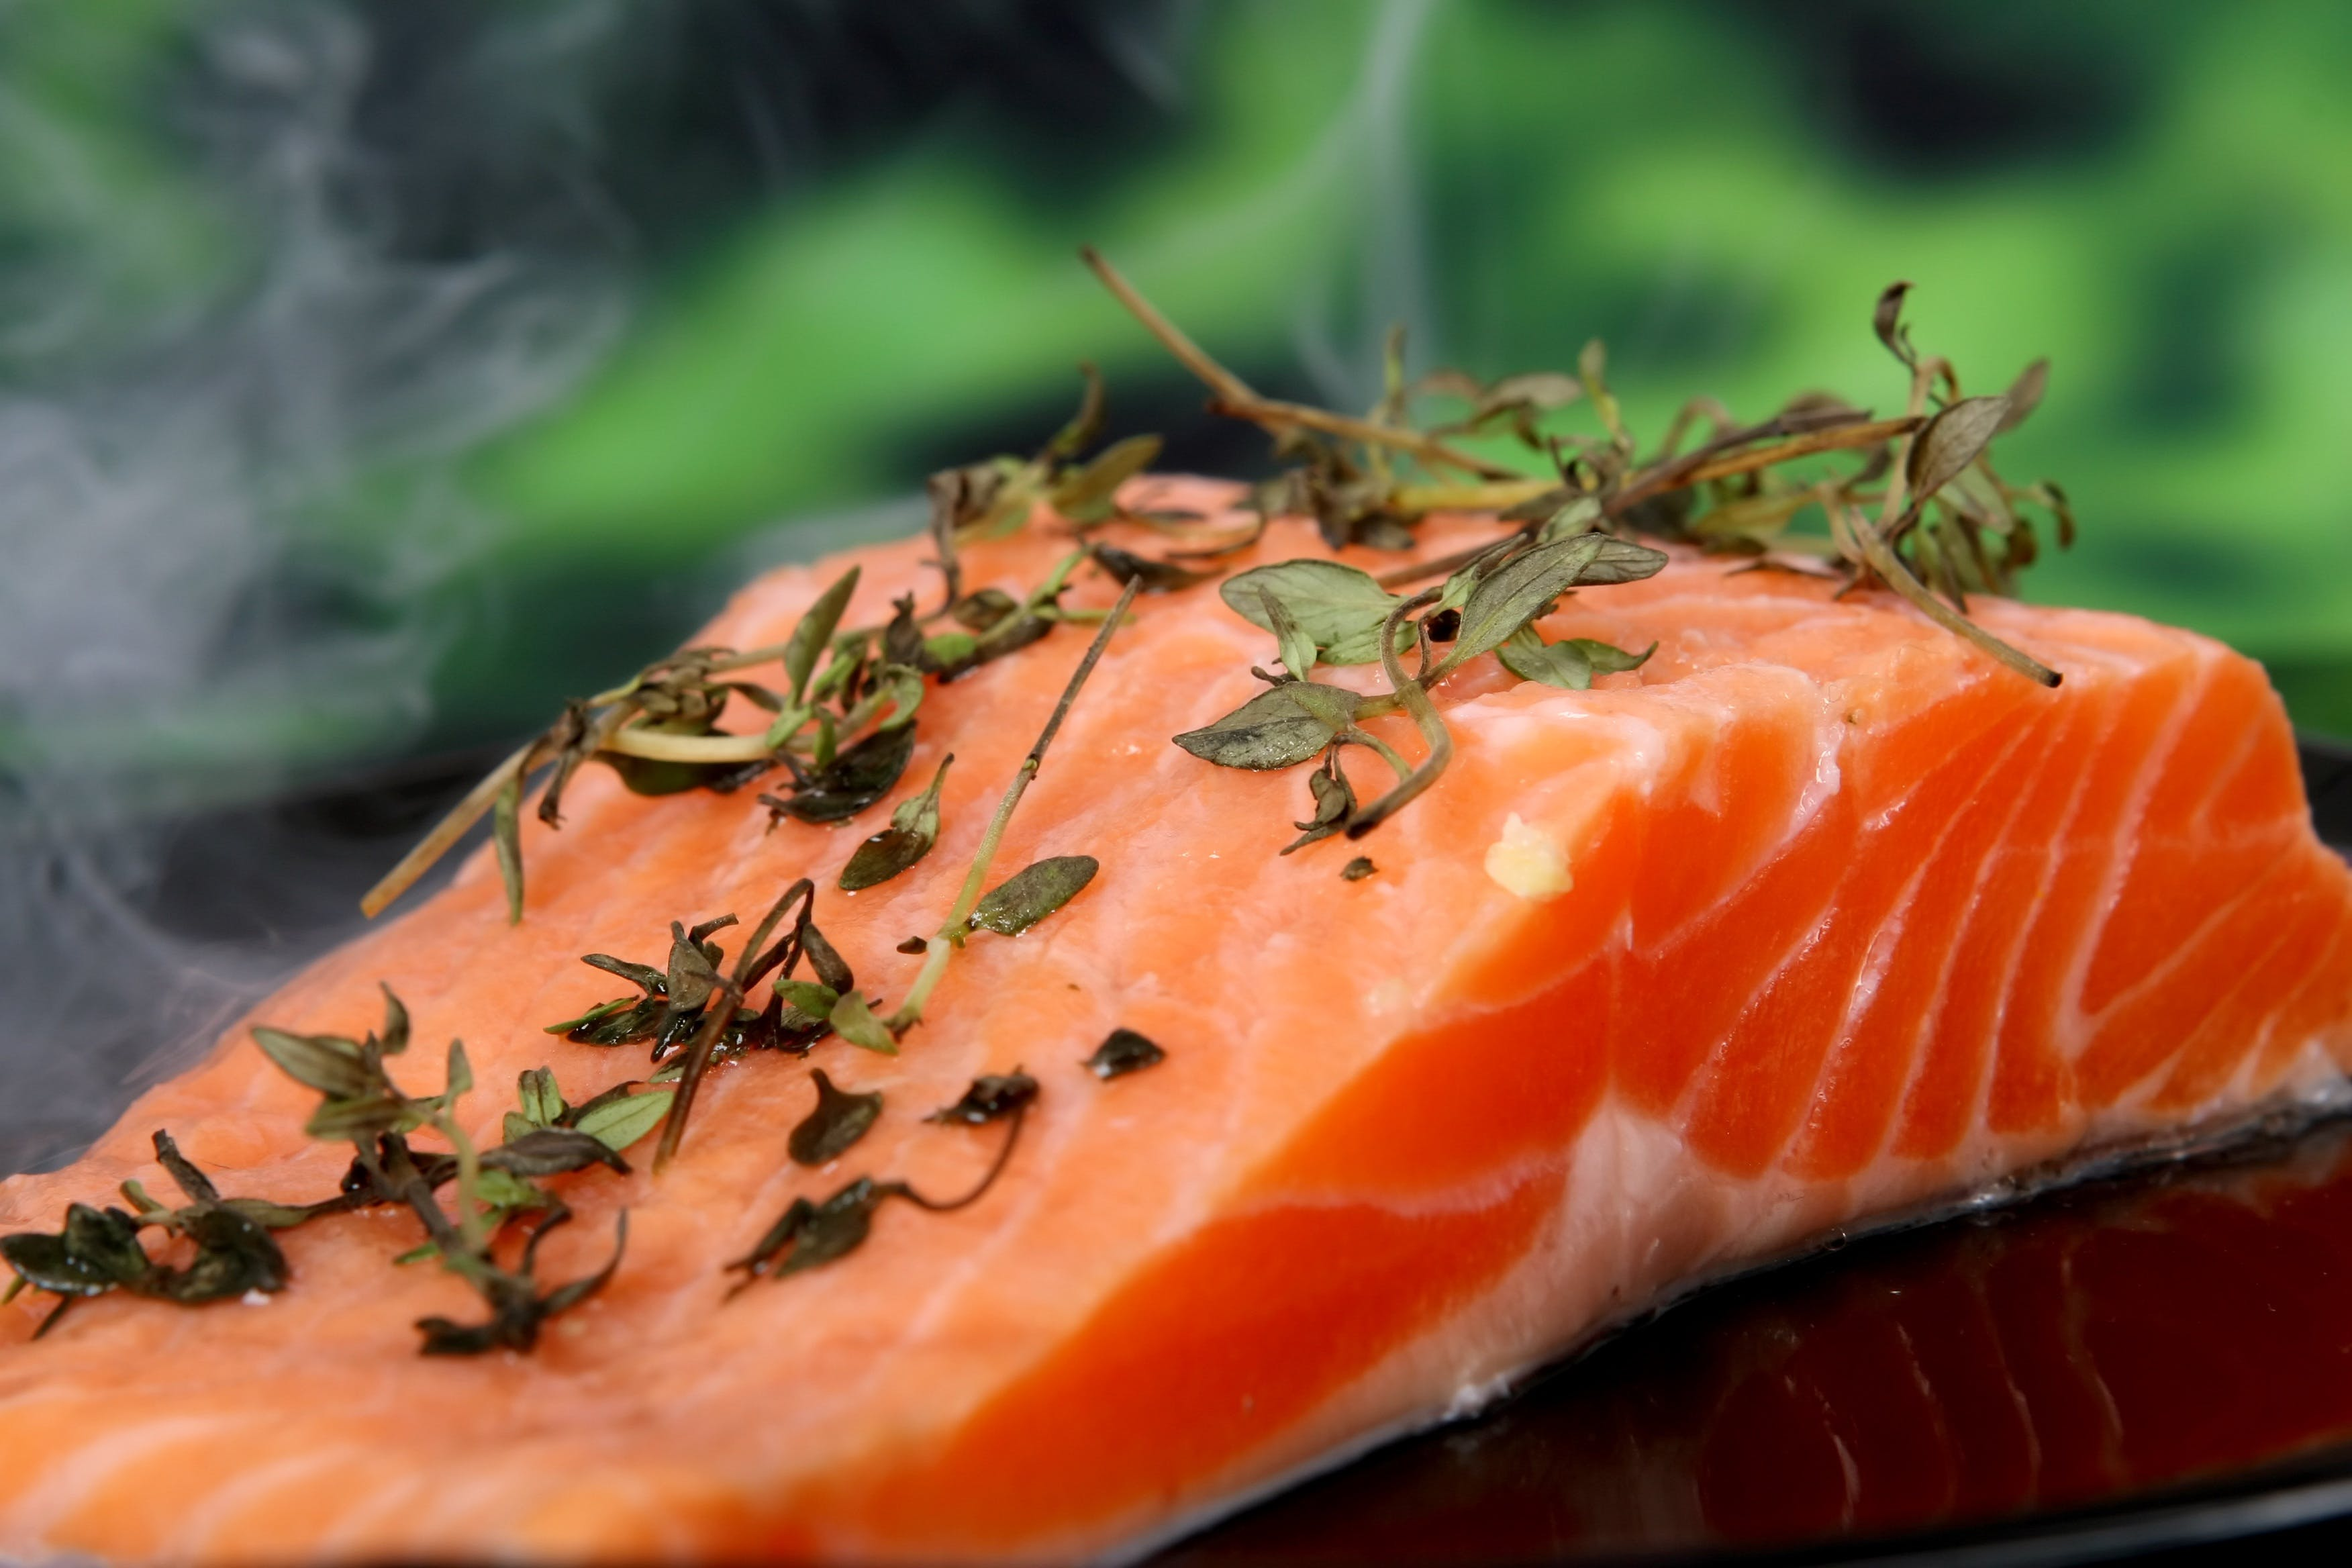 Sliced Tuna With Green Leaf Vegetables